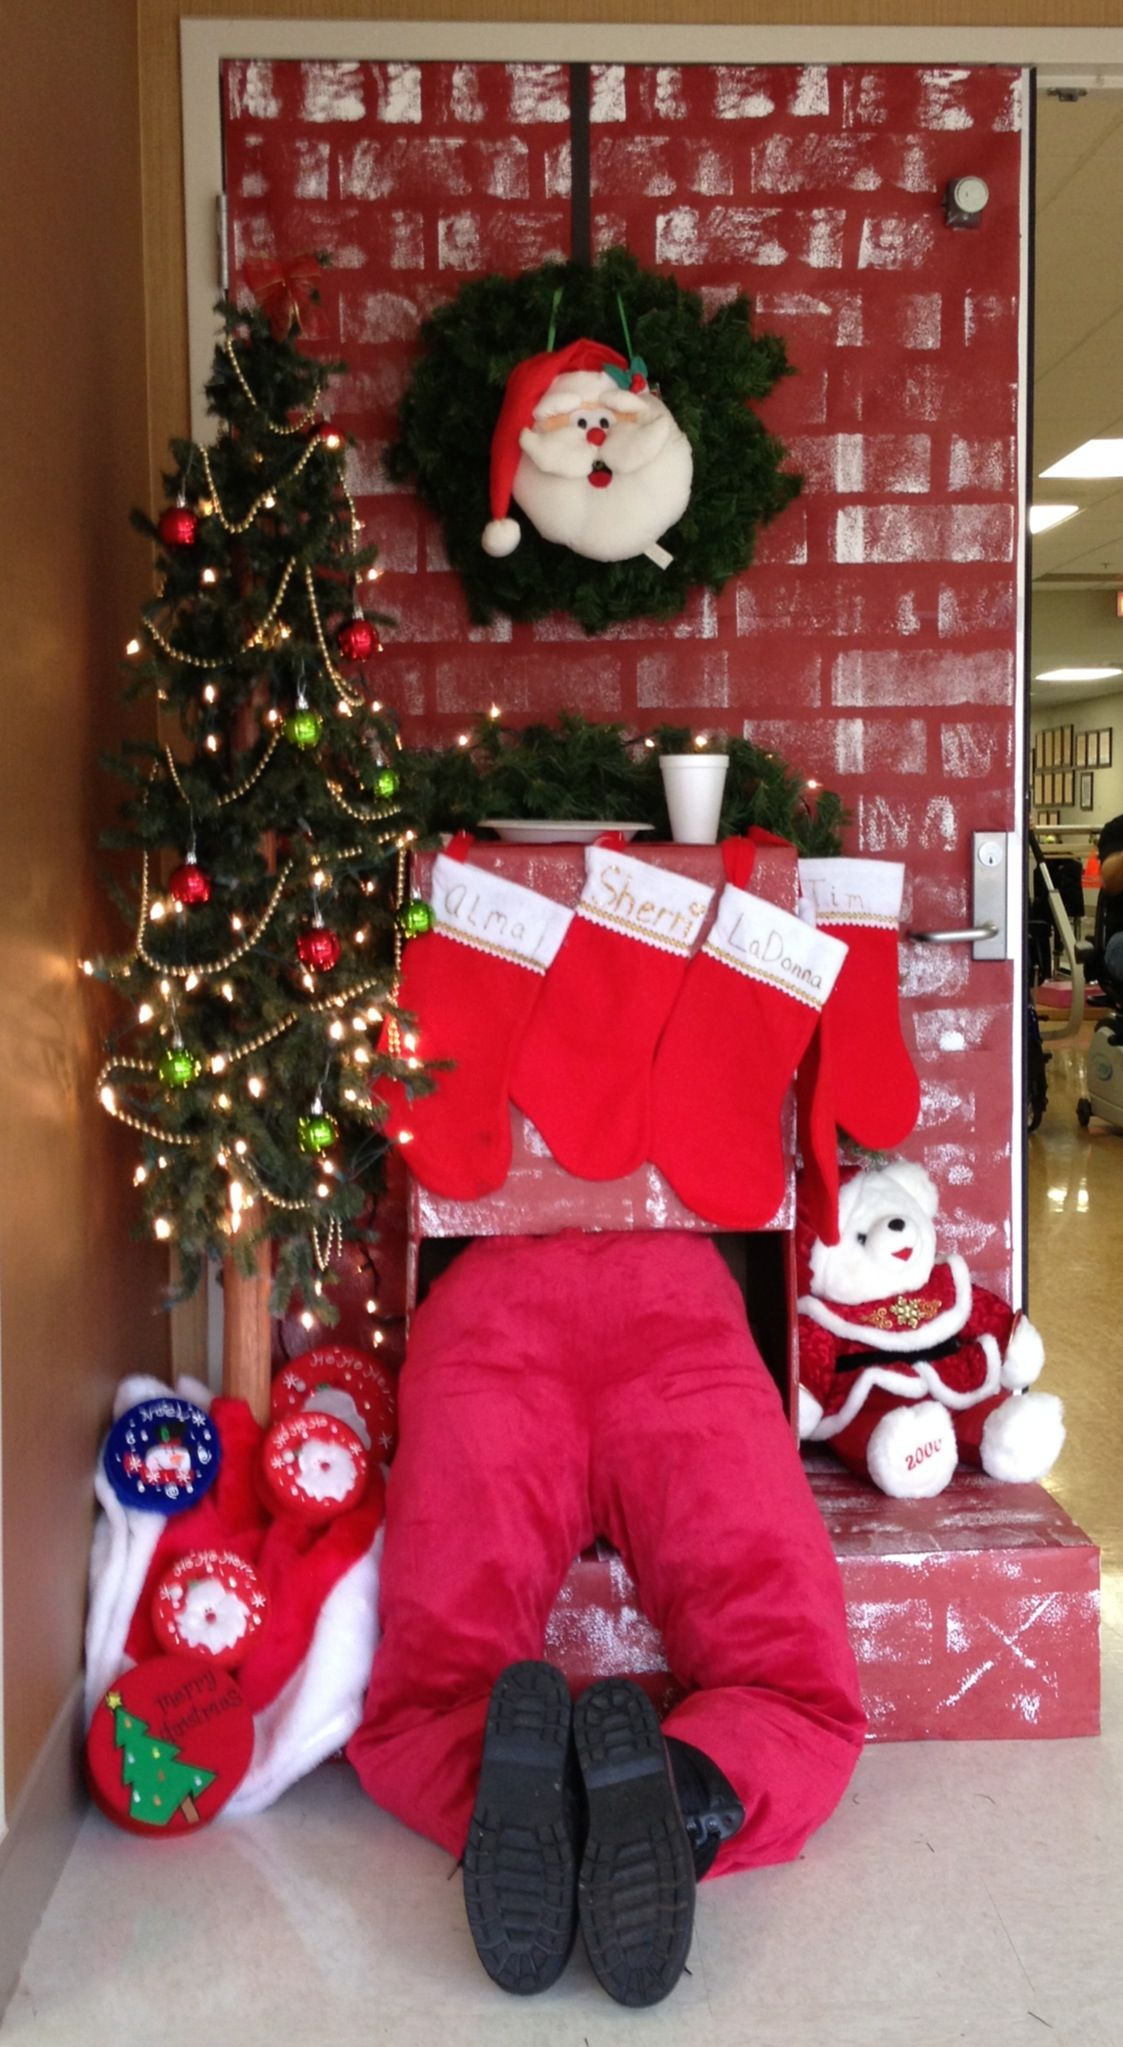 Santa In Fireplace Santa In Chimney Door Decoration With